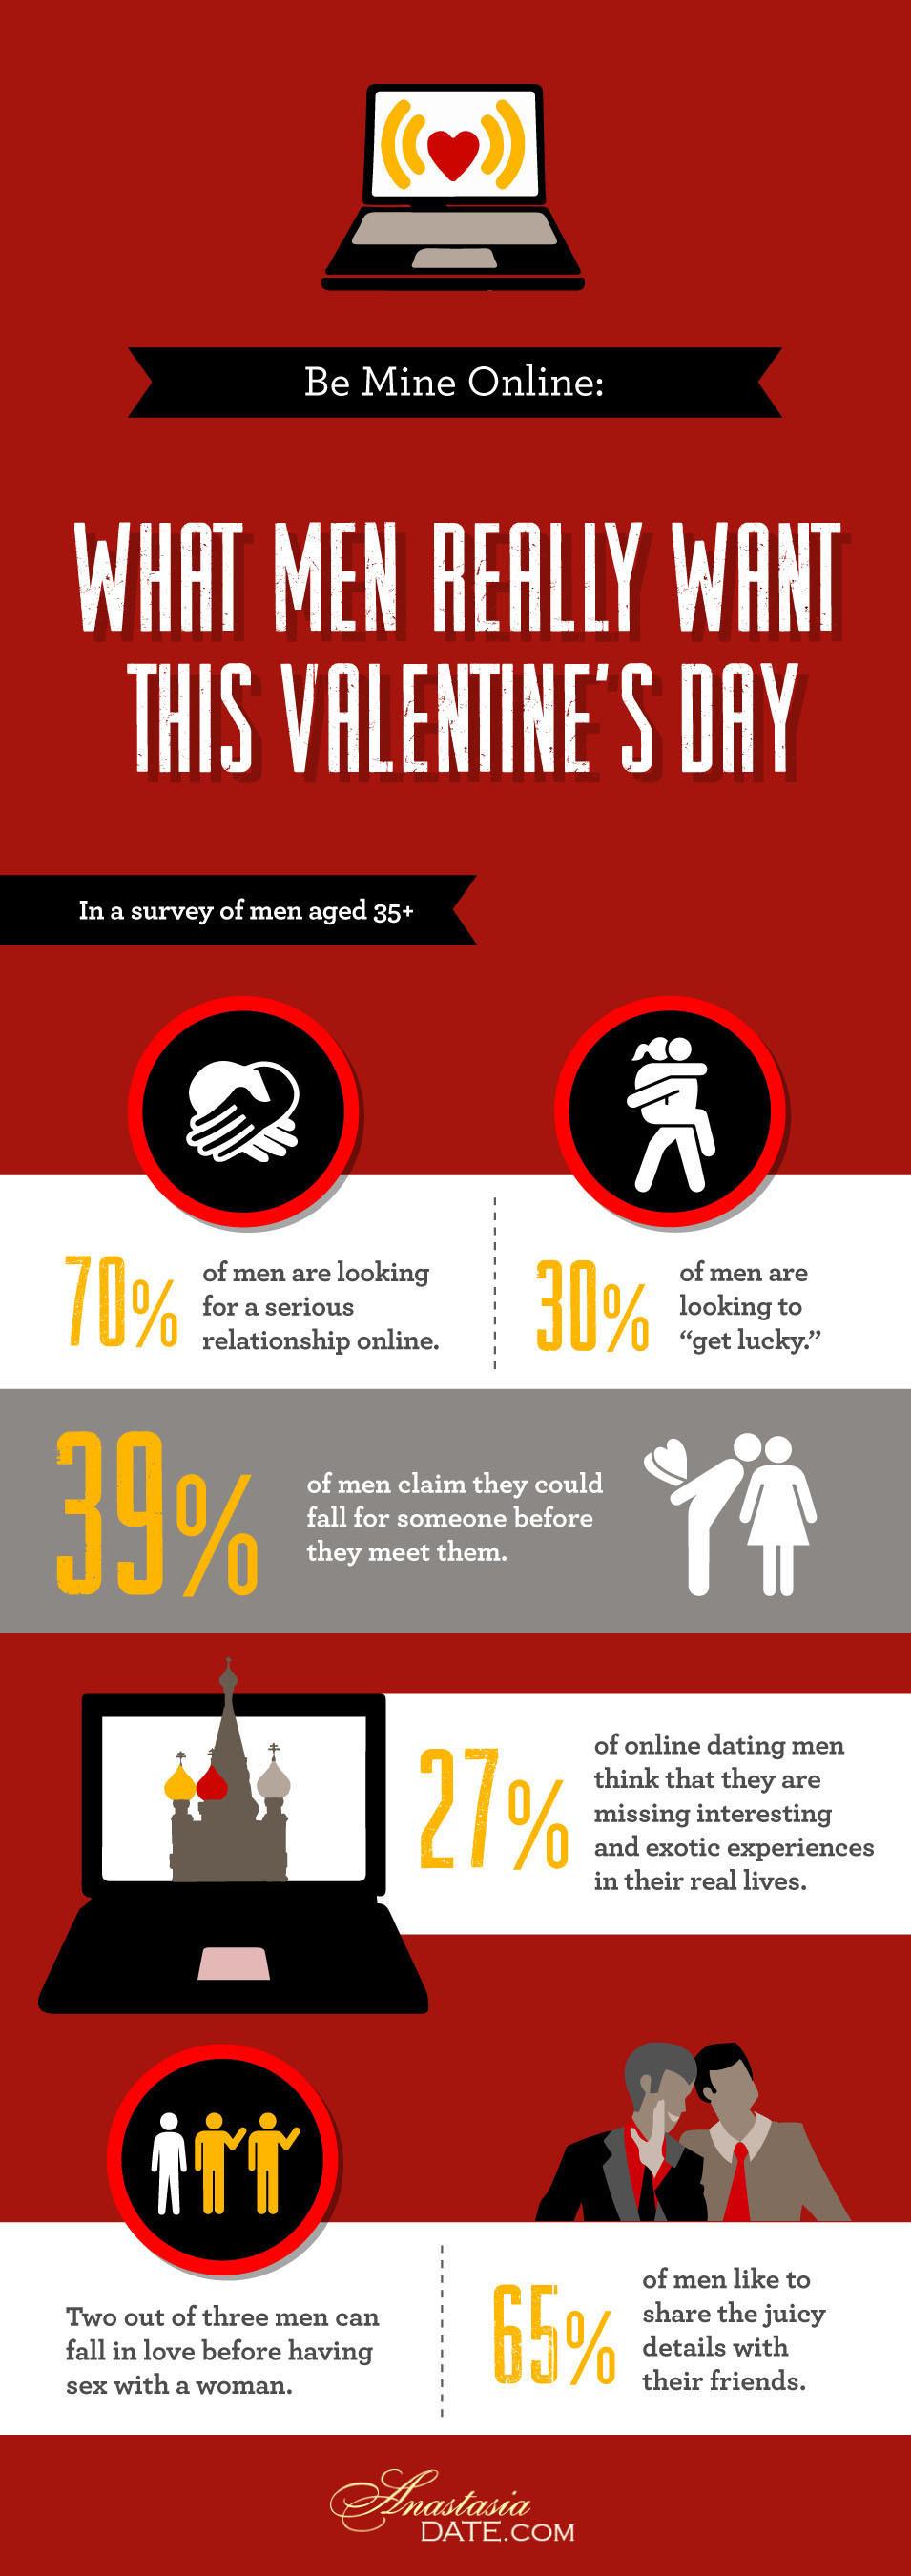 Be Mine Online: New Survey Reveals What Guys Really Want this Valentine's Day.  (PRNewsFoto/AnastasiaDate)